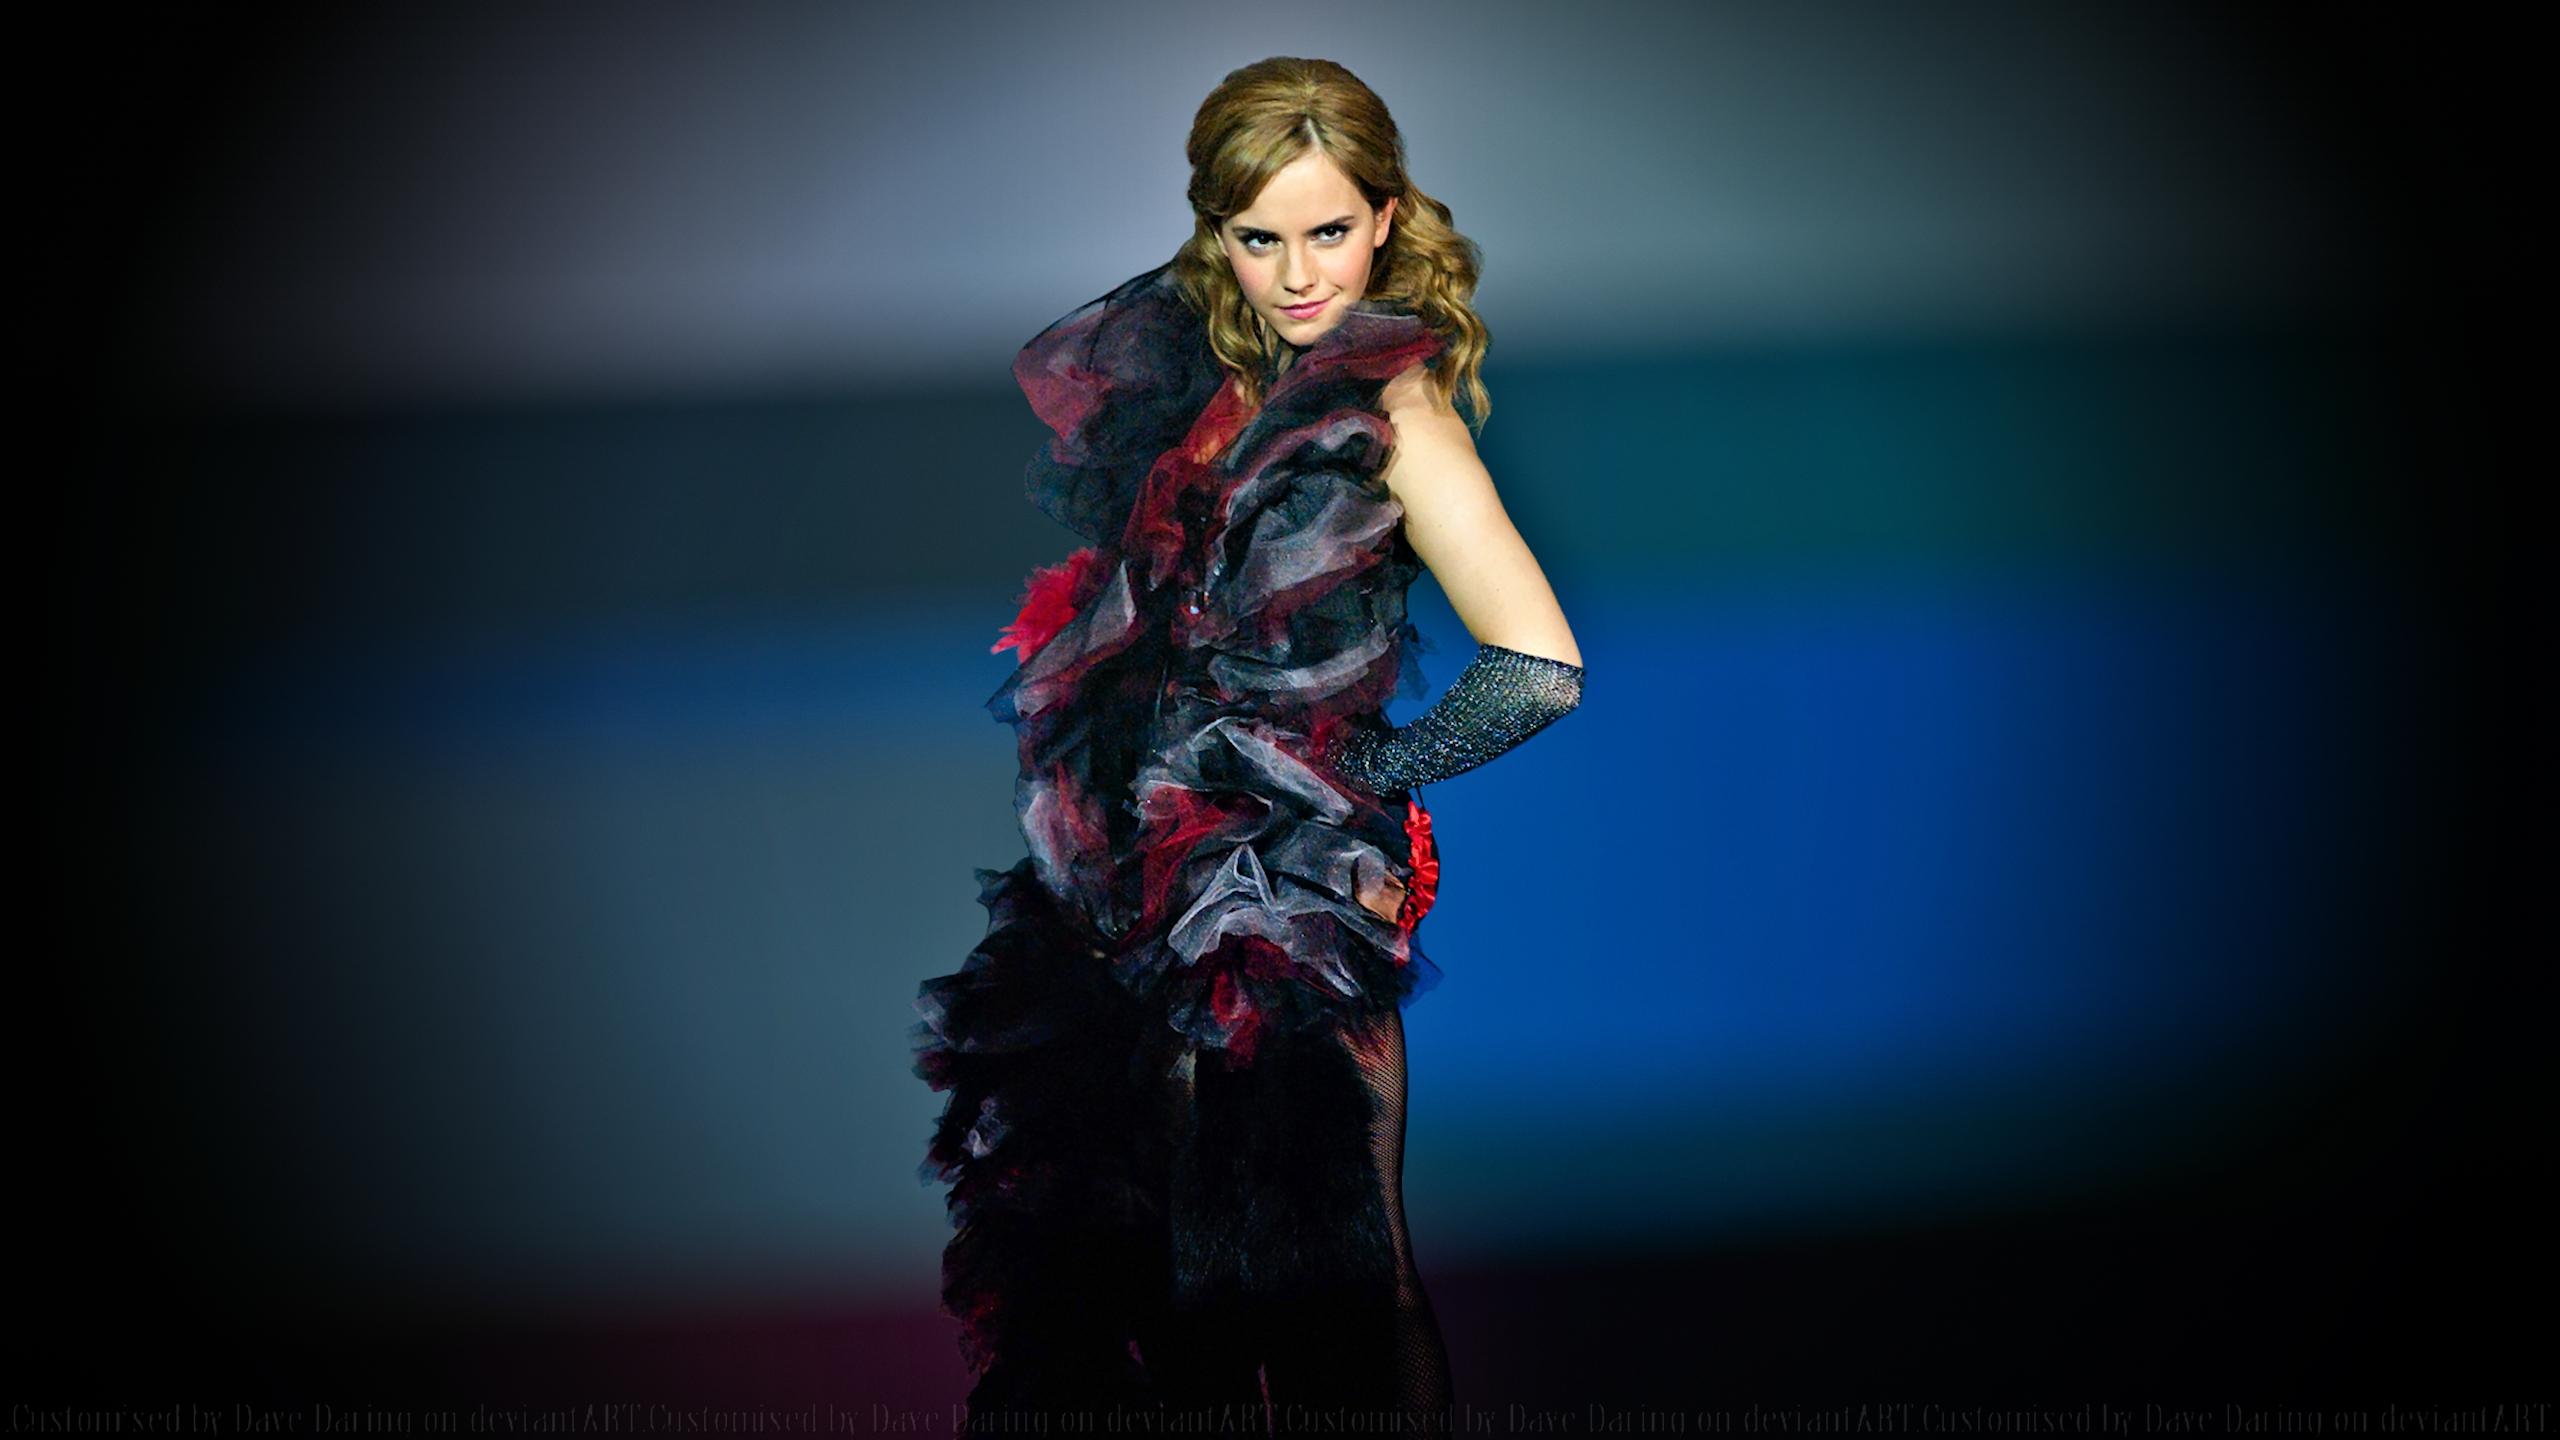 Emma Watson Wallflower by Dave-Daring